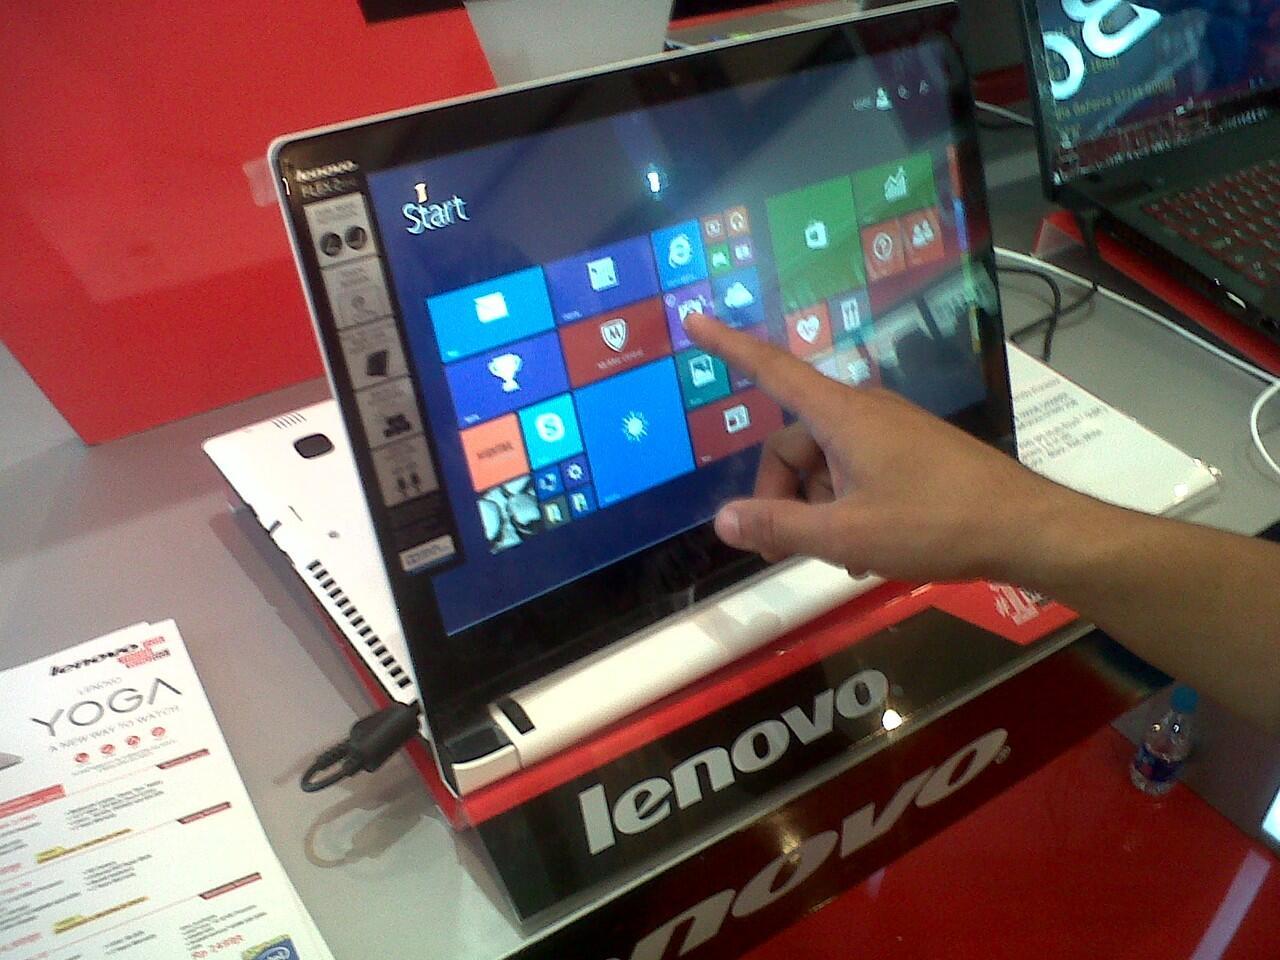 JUAL:Unit Terlaris Laptop Lenovo Thinkpad New...